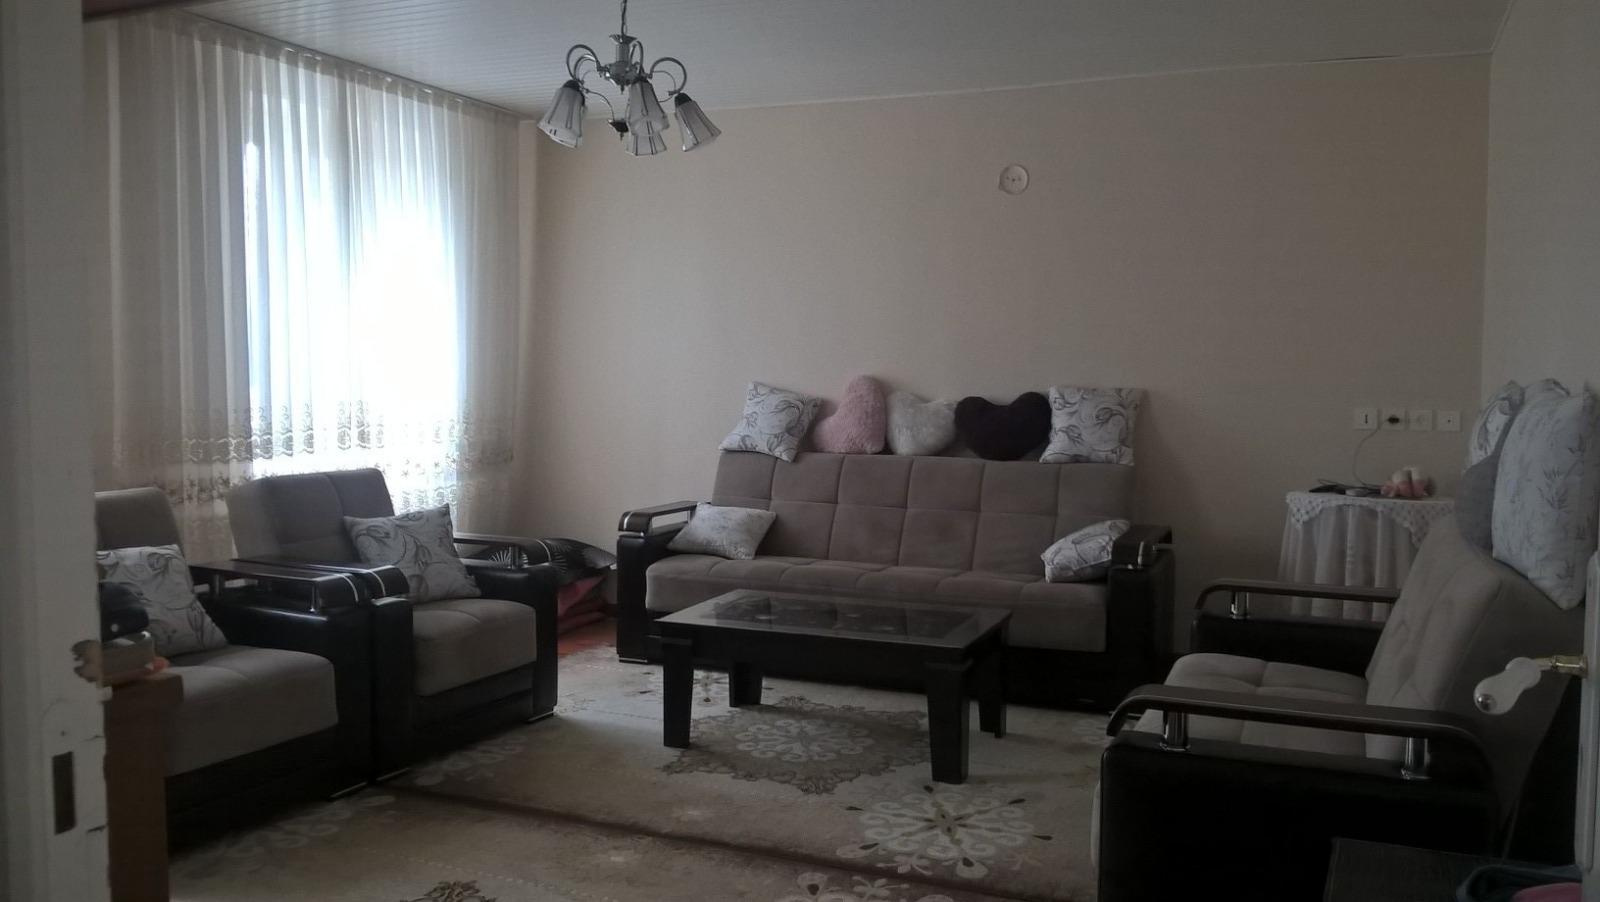 vente bourg de thizy. Black Bedroom Furniture Sets. Home Design Ideas